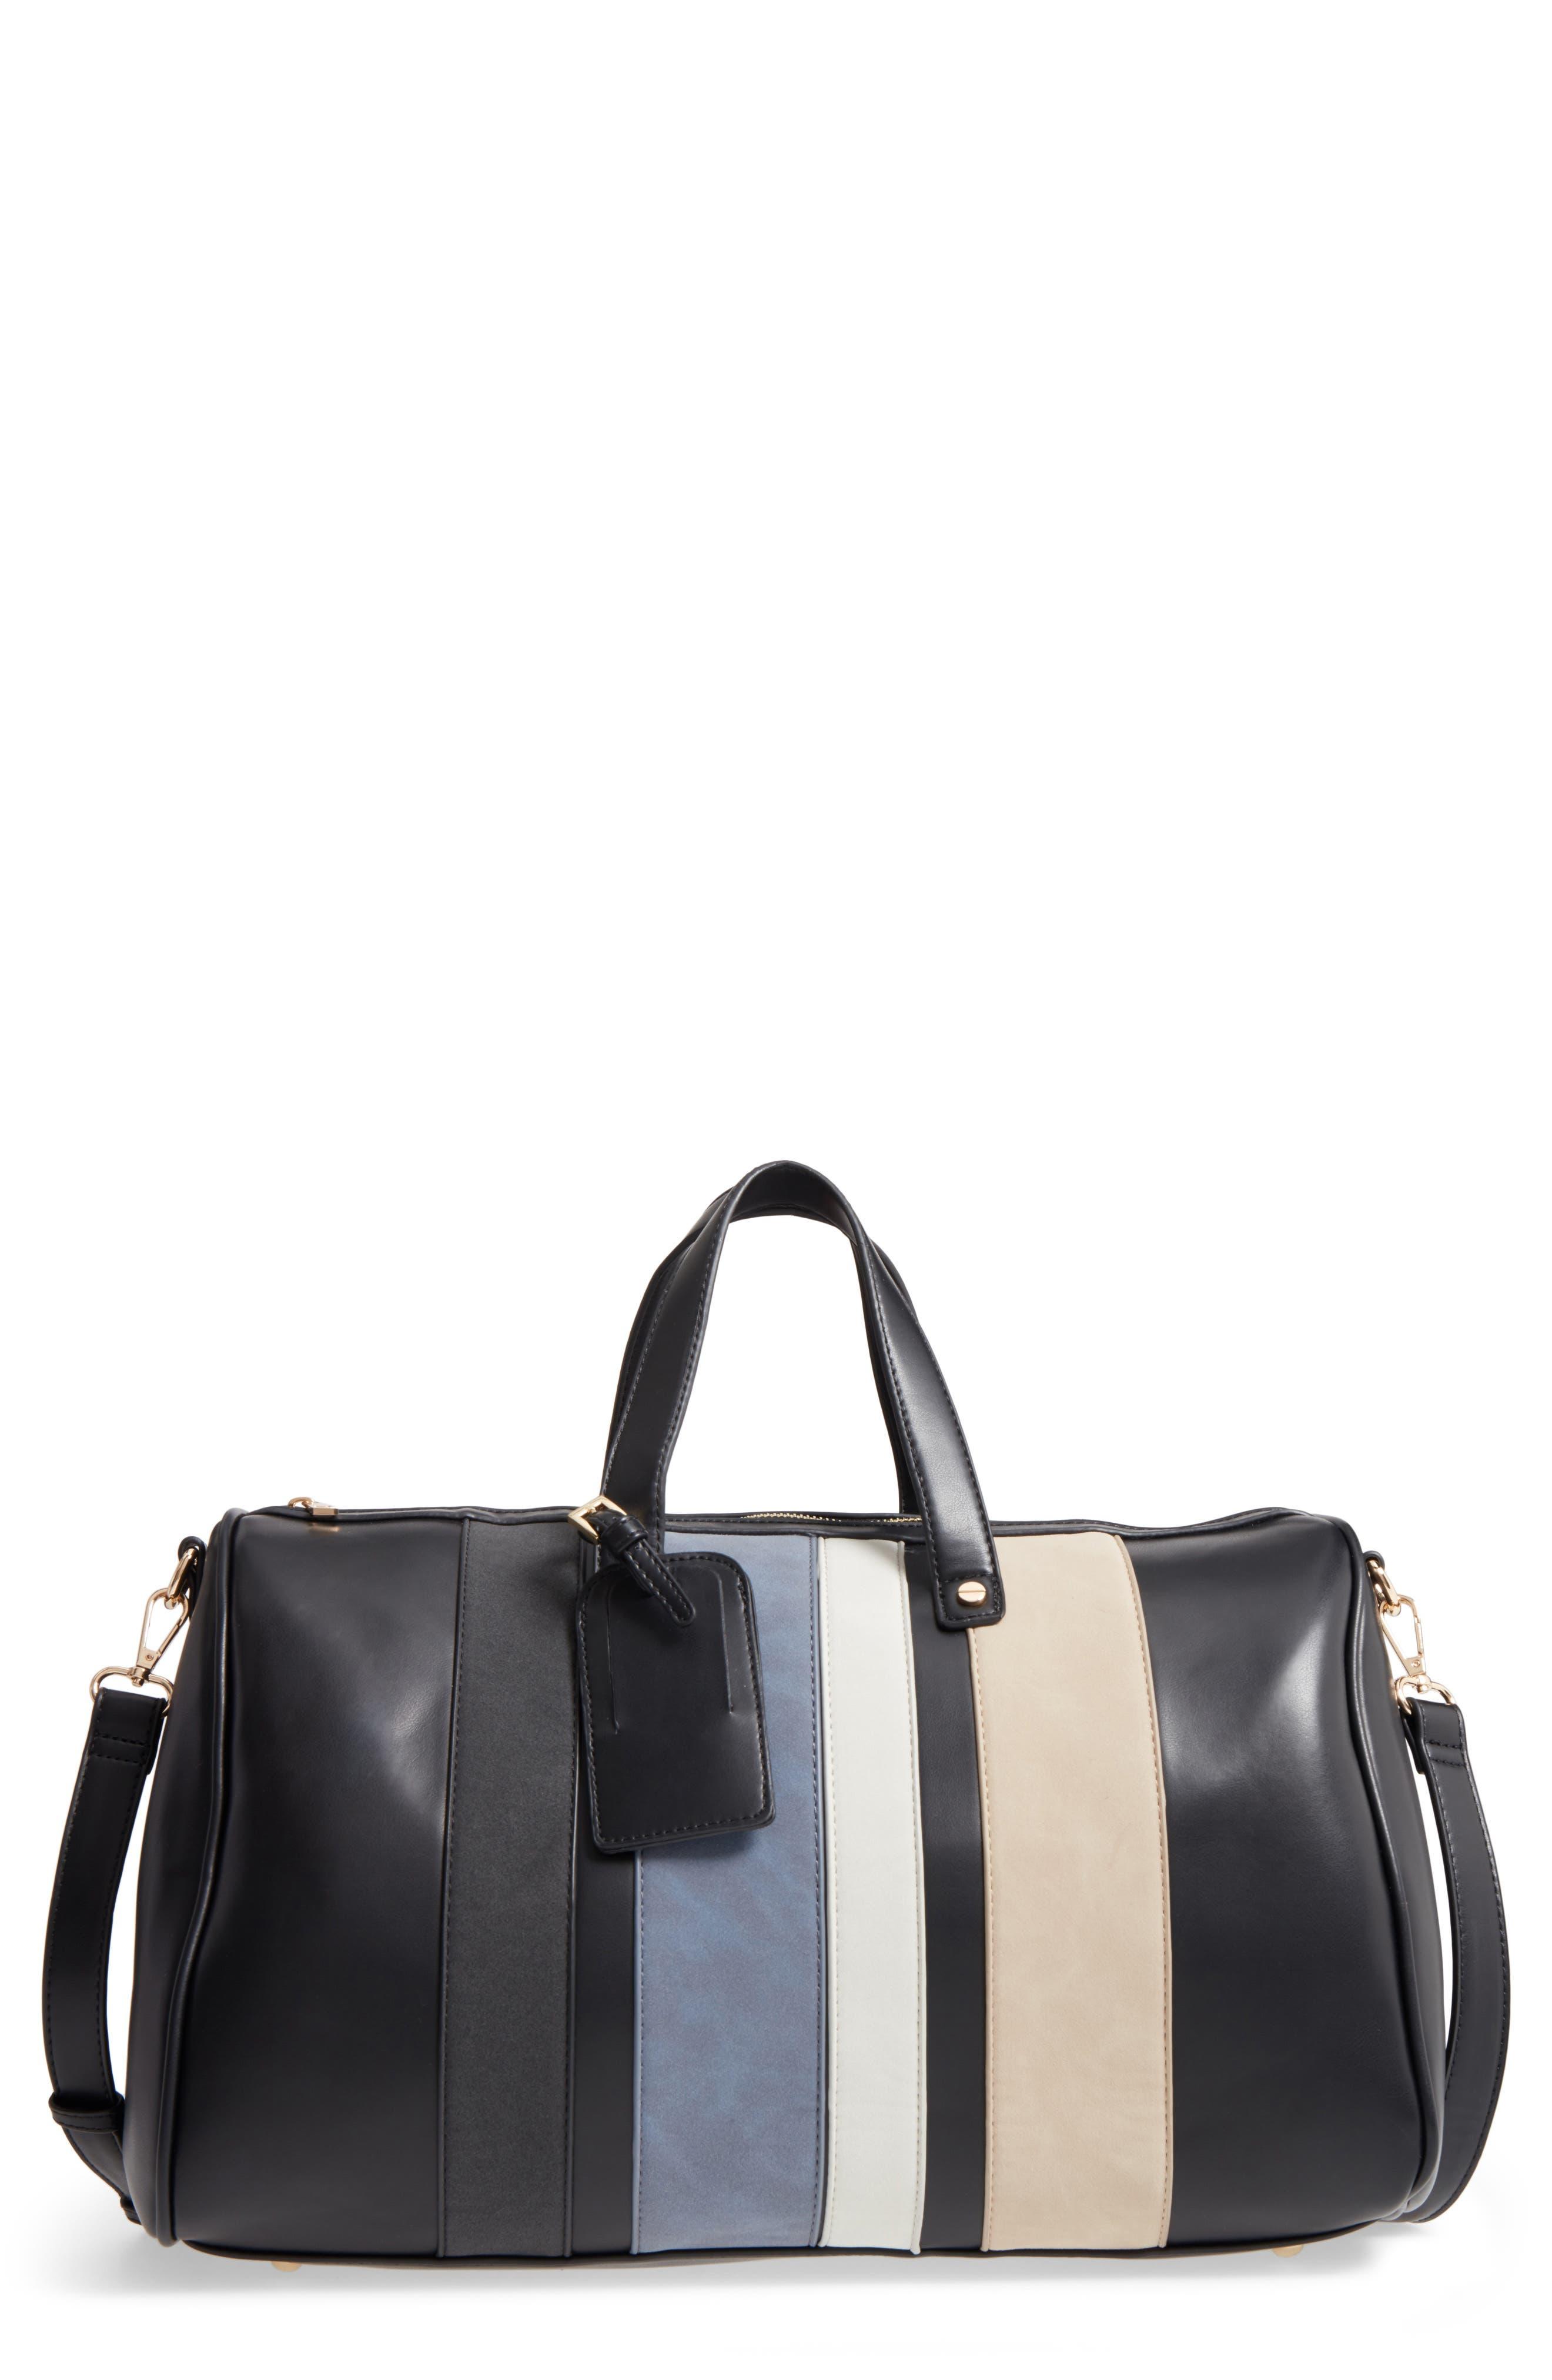 Stripe Faux Leather Duffel Bag,                             Main thumbnail 1, color,                             001